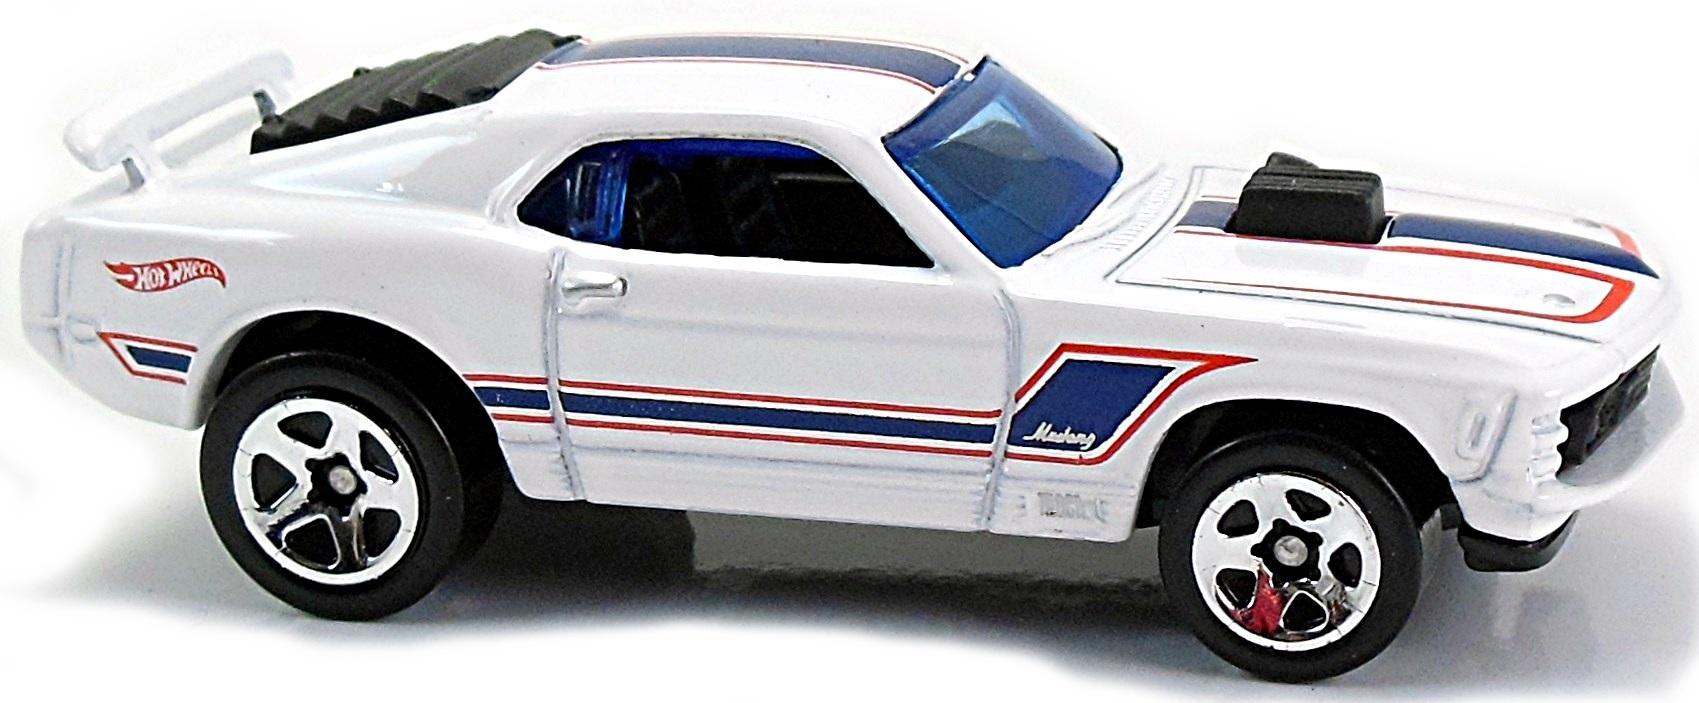 2015 Mustang Mach 1 >> 2017 American Muscle/Racing Circuit | Hot Wheels Newsletter